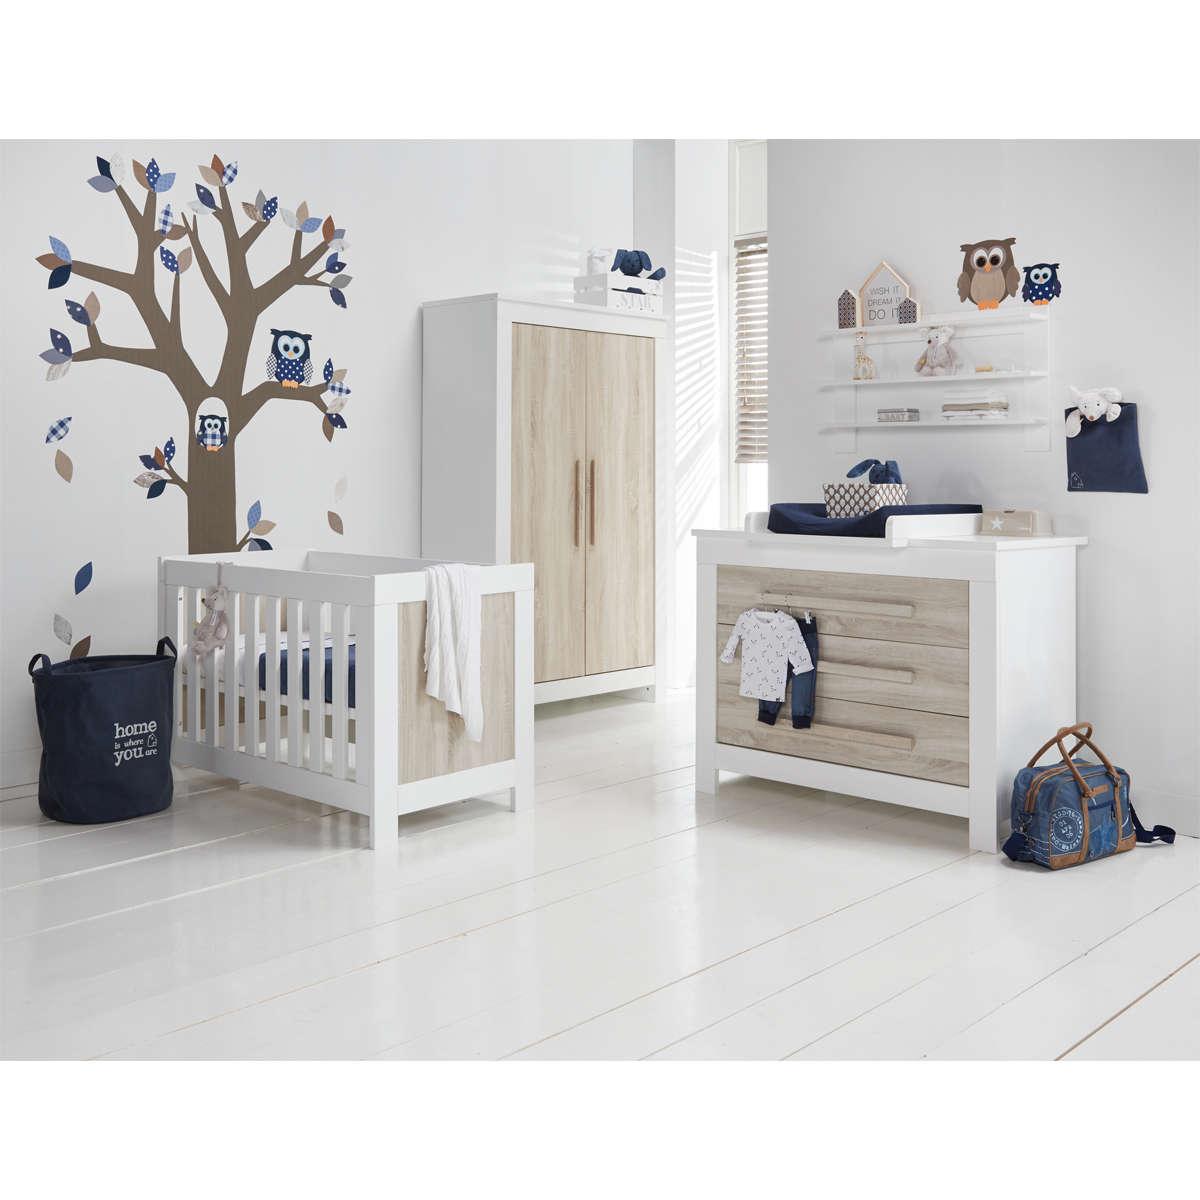 armoire bebe but destine chambre bebe